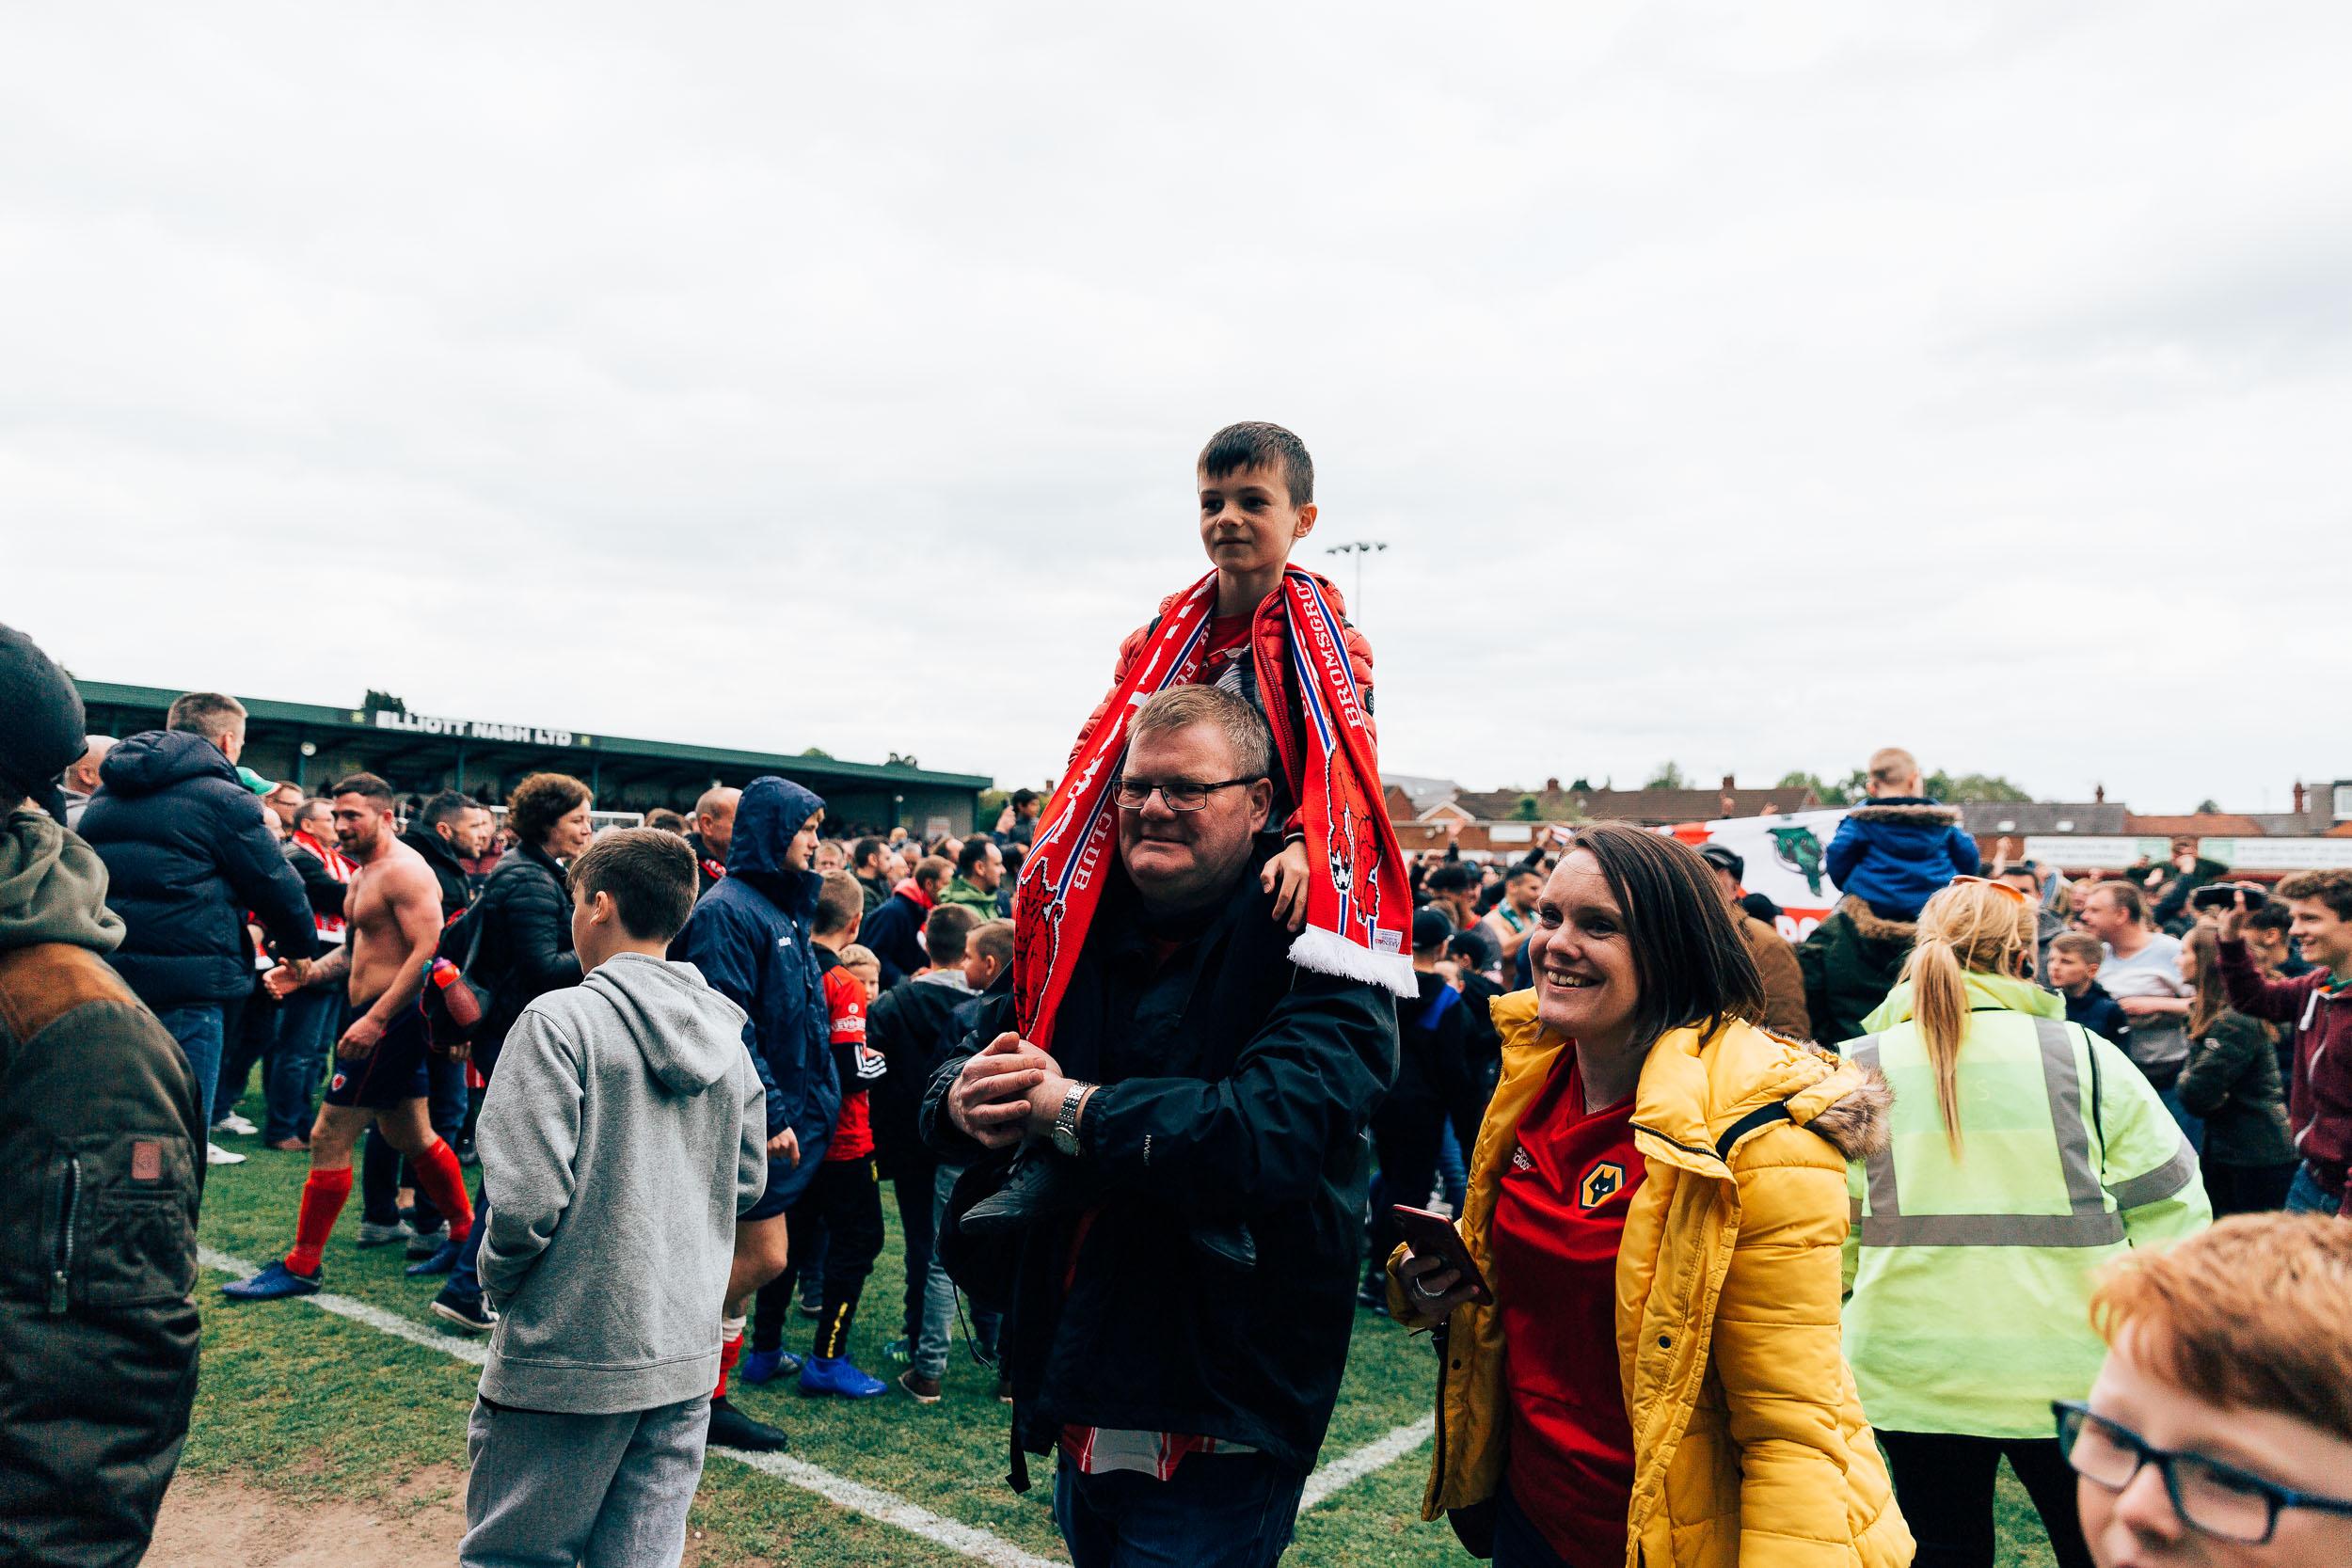 06_05_2019_Bromsgrove_Sporting_Corby-191.jpg